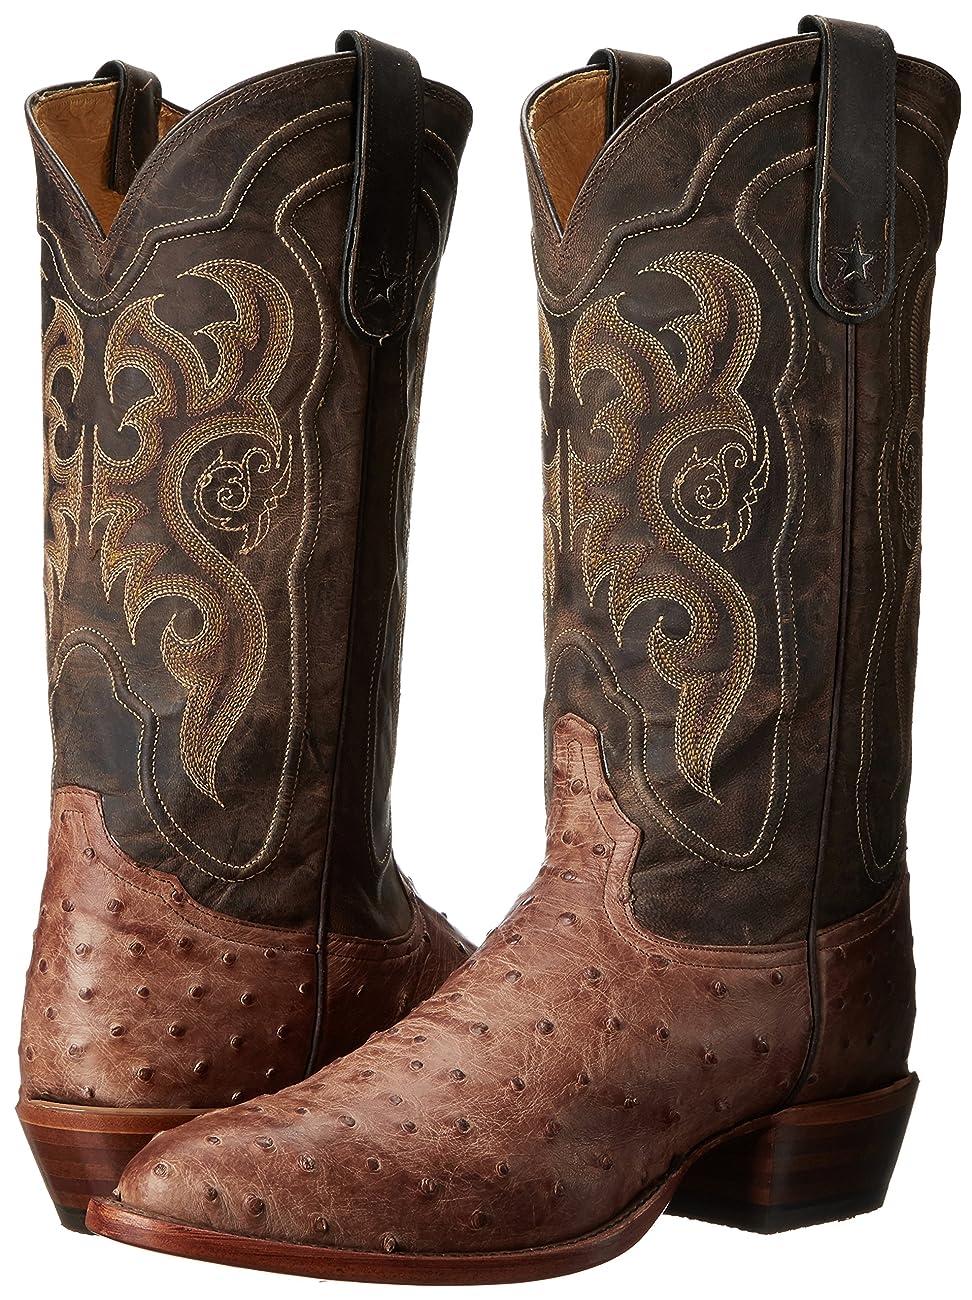 Tony Lama Boots Men's Vintage Ostrich 8965 Western Boot 6